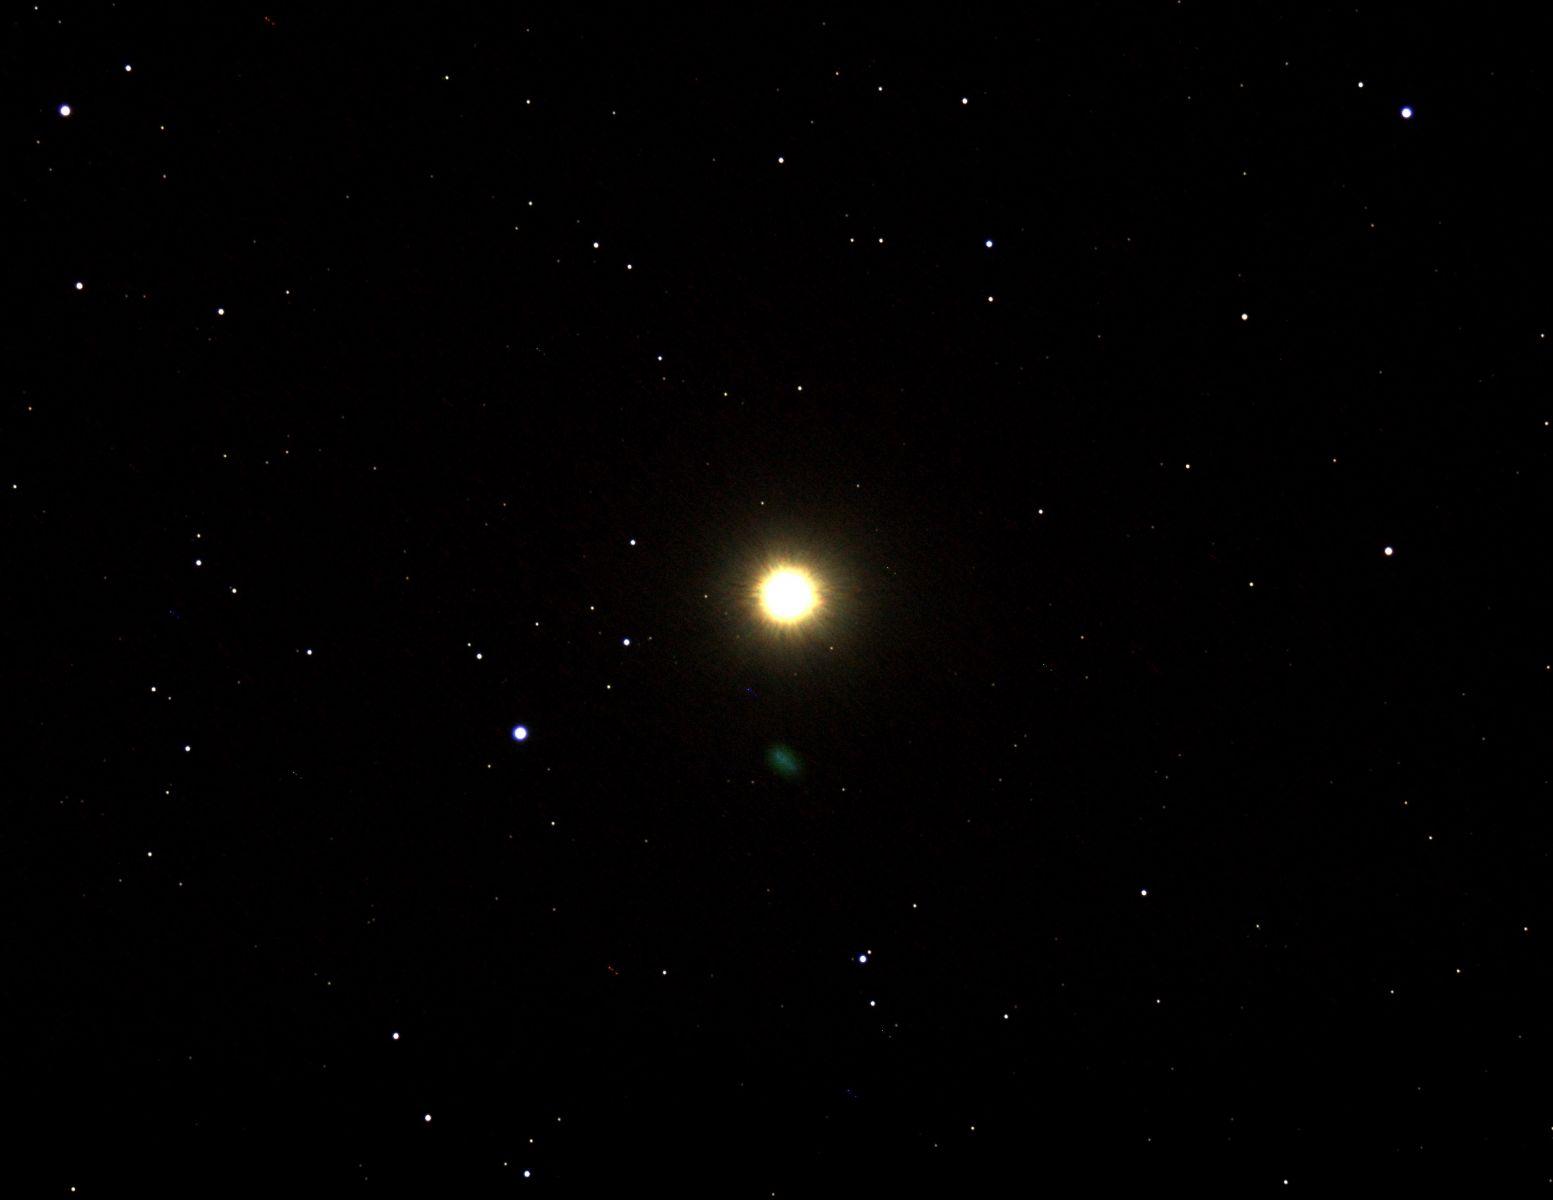 Арктур и комета C/2013 UQ4 (Catalina)